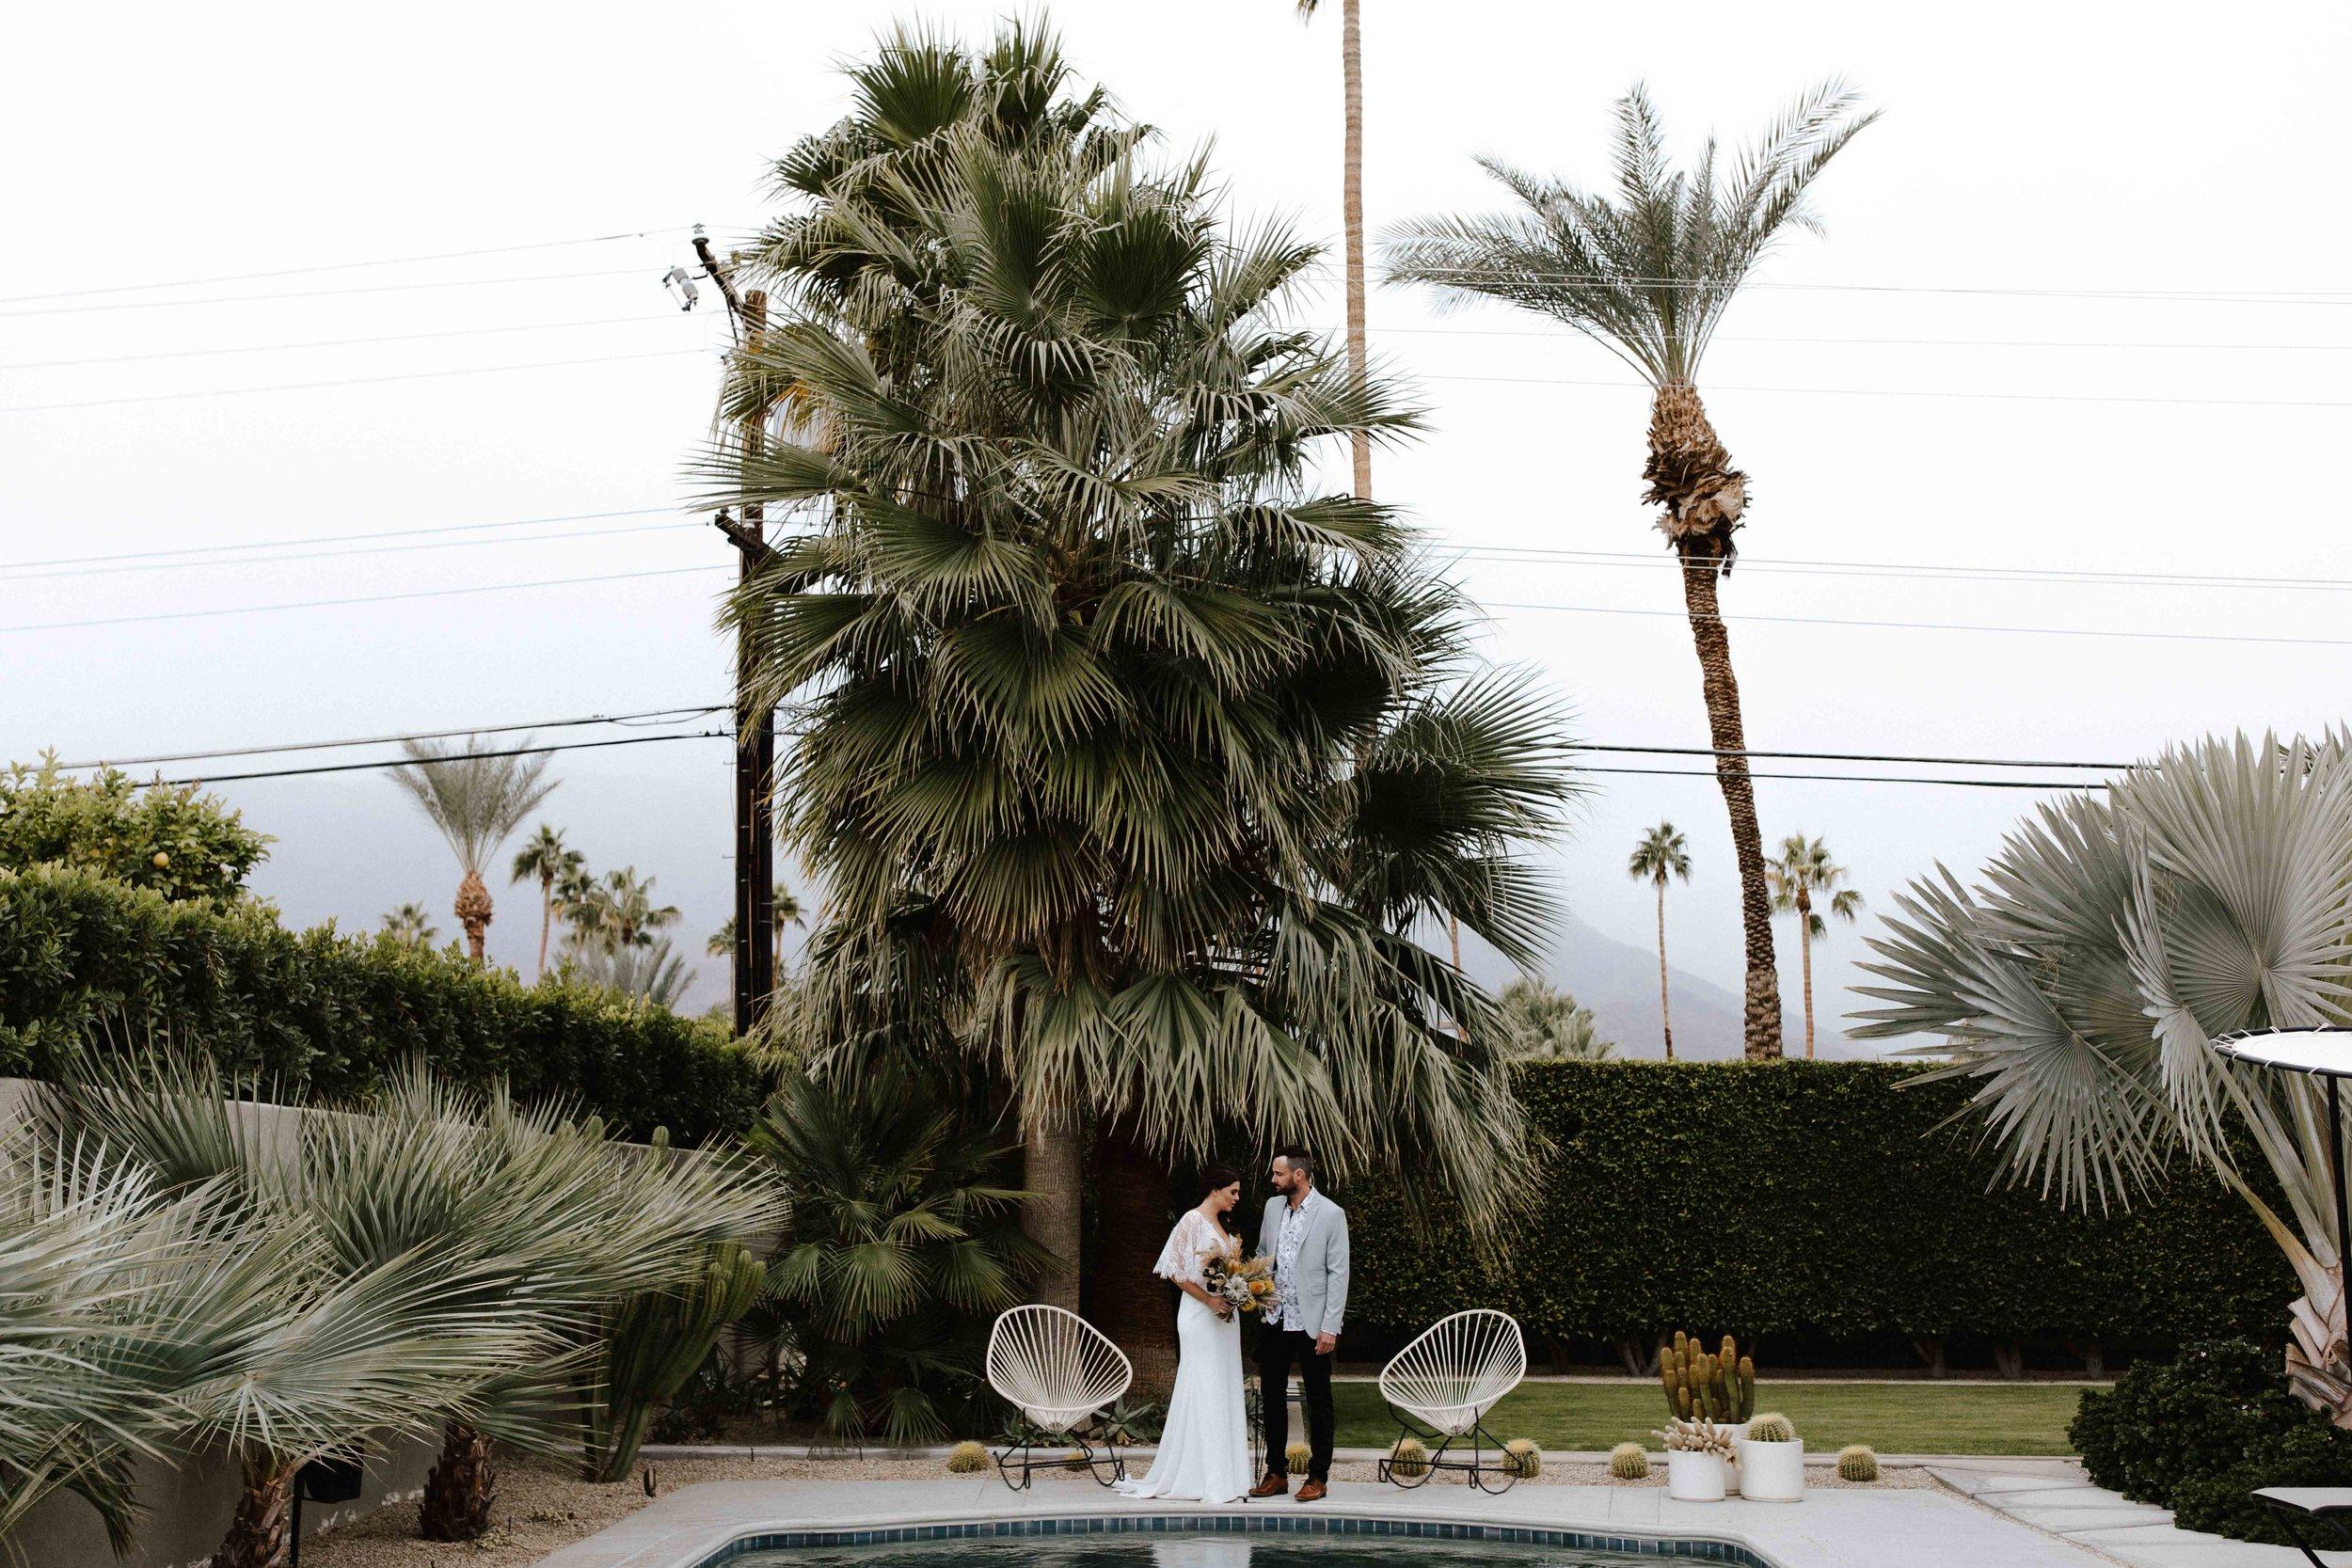 America Joshua Tree Palm Springs Elopement wedding-18.jpg